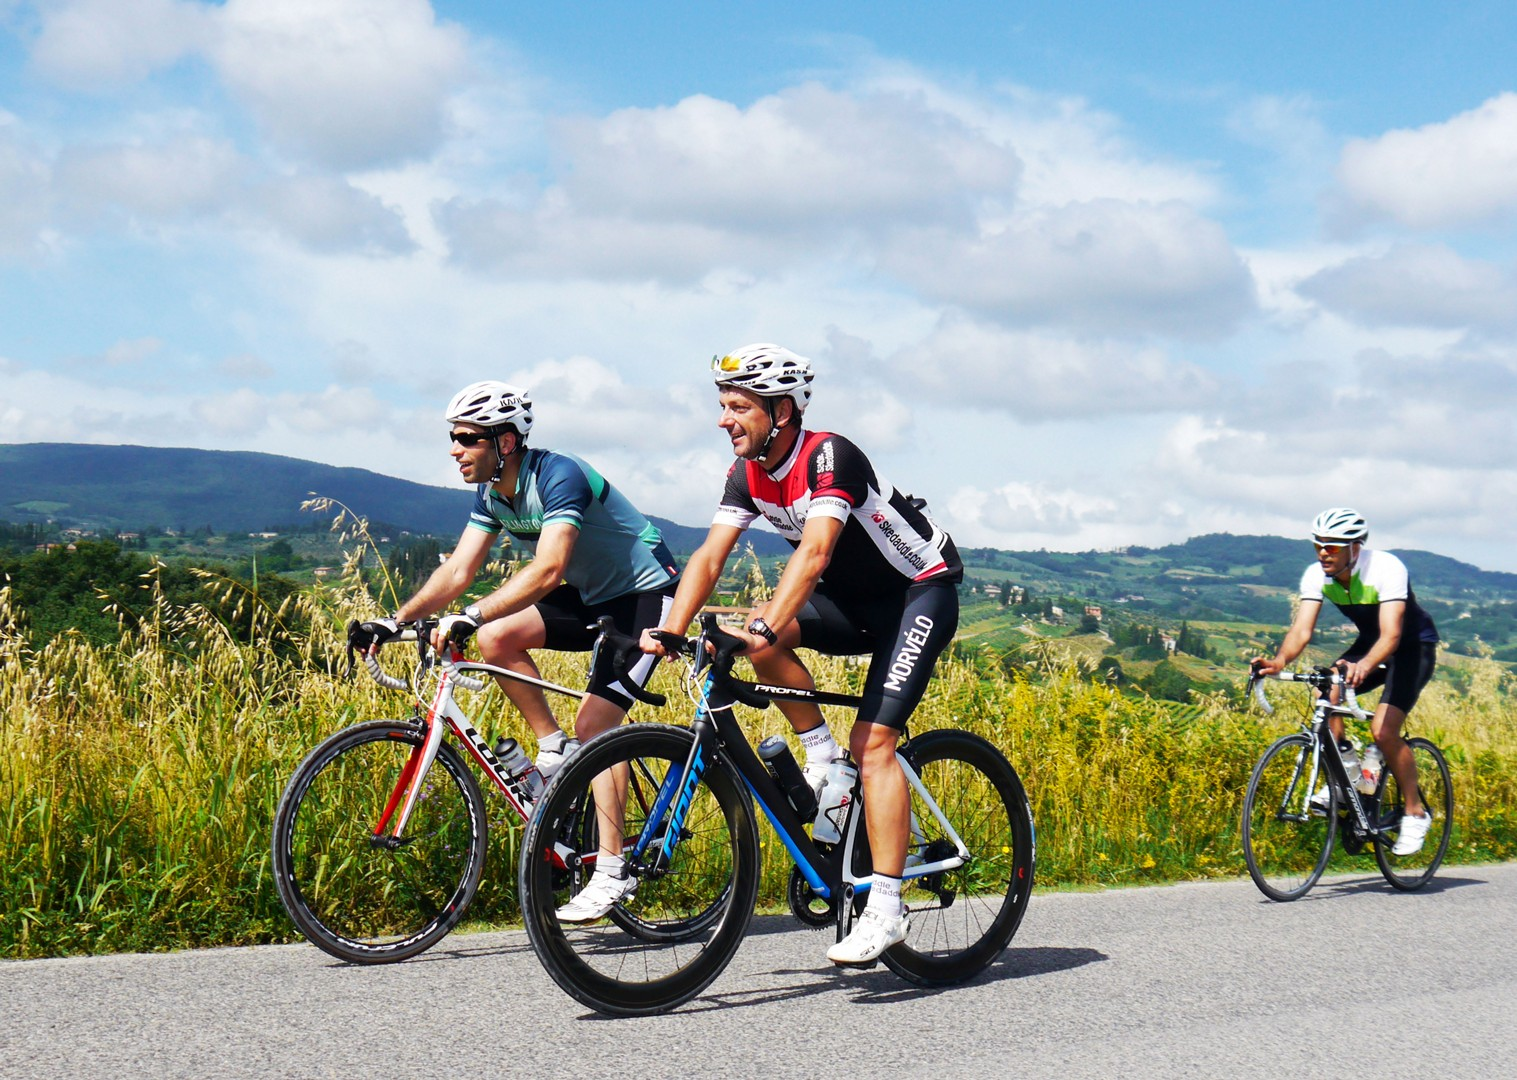 italy-tuscany-guided-cycling-holiday.jpg - Italy - Tuscany Tourer - Road Cycling